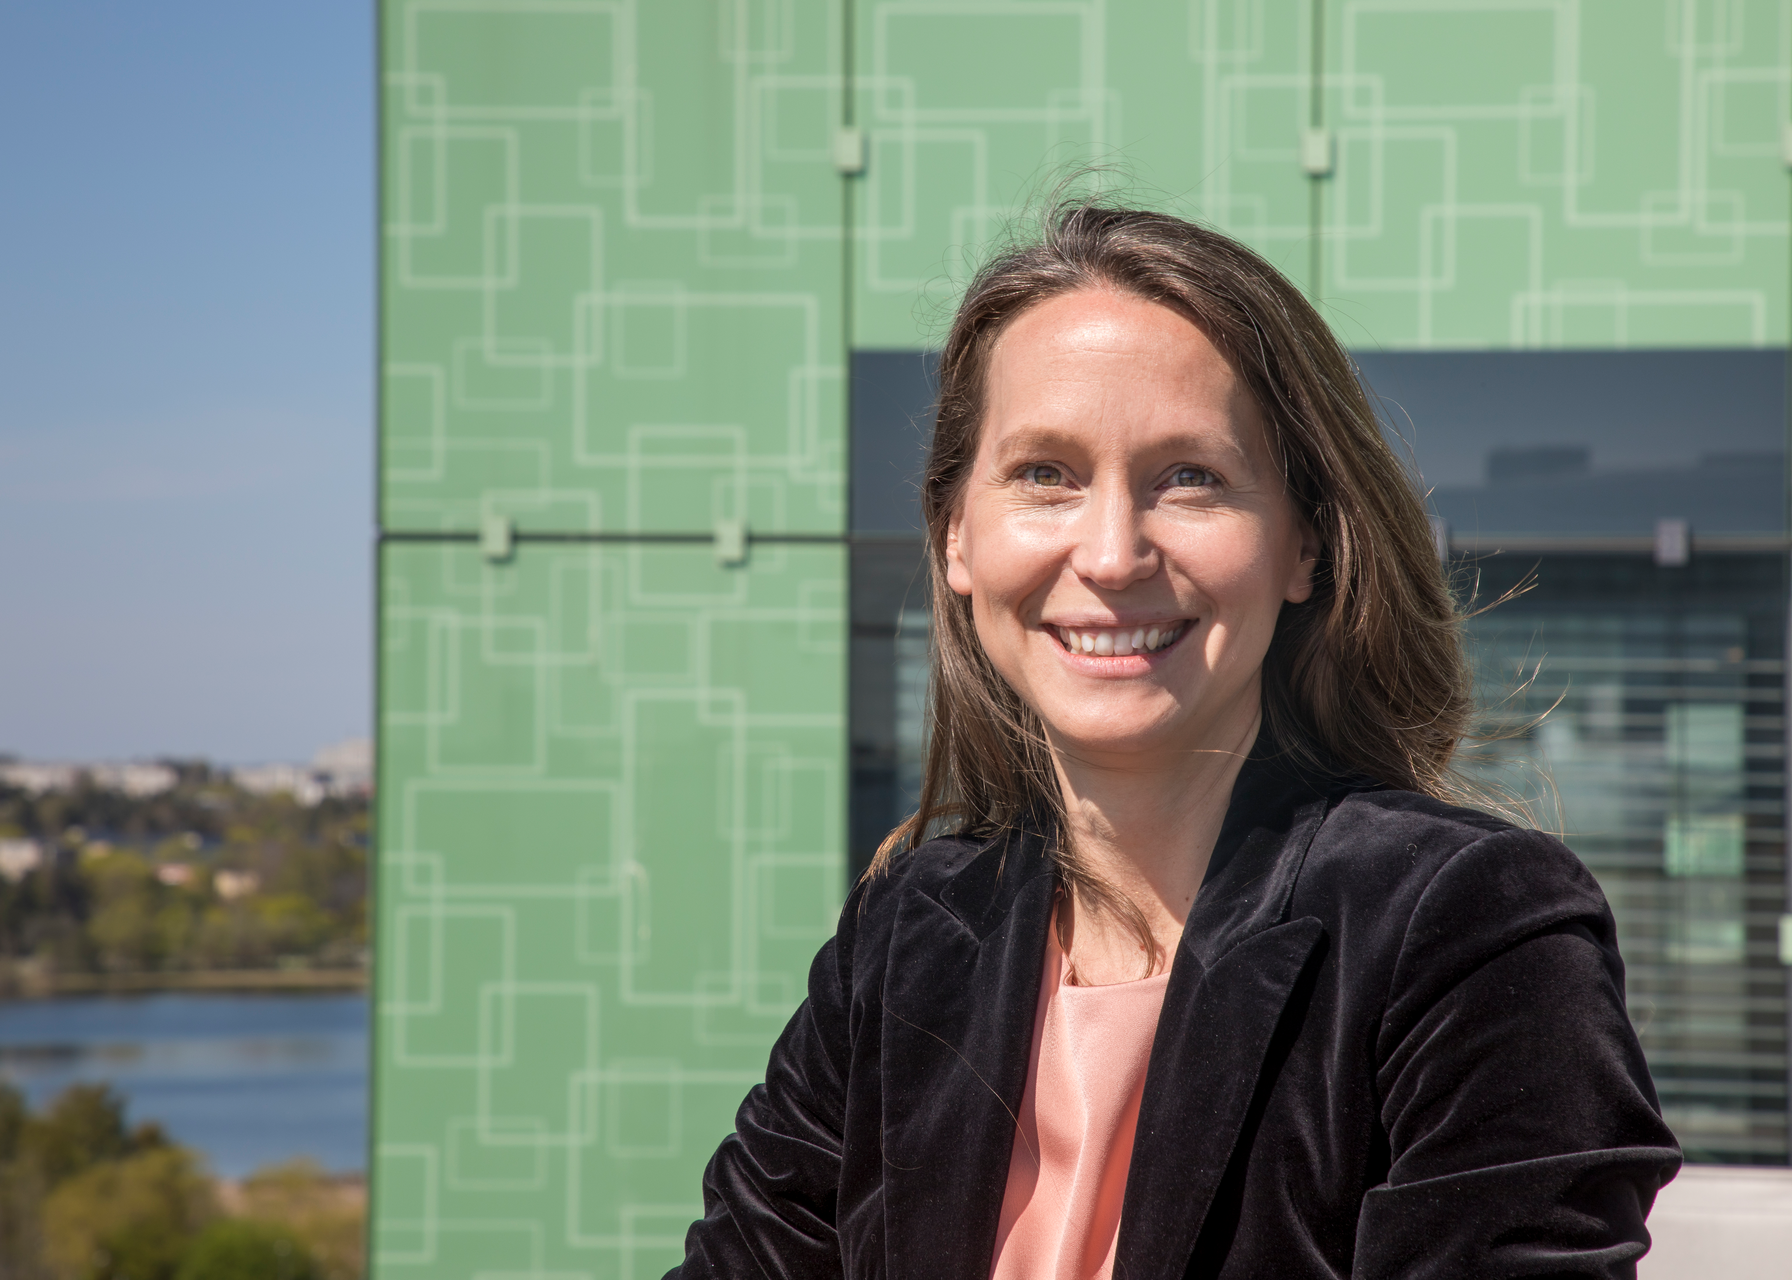 Susanna Hurtig, Vattenfall